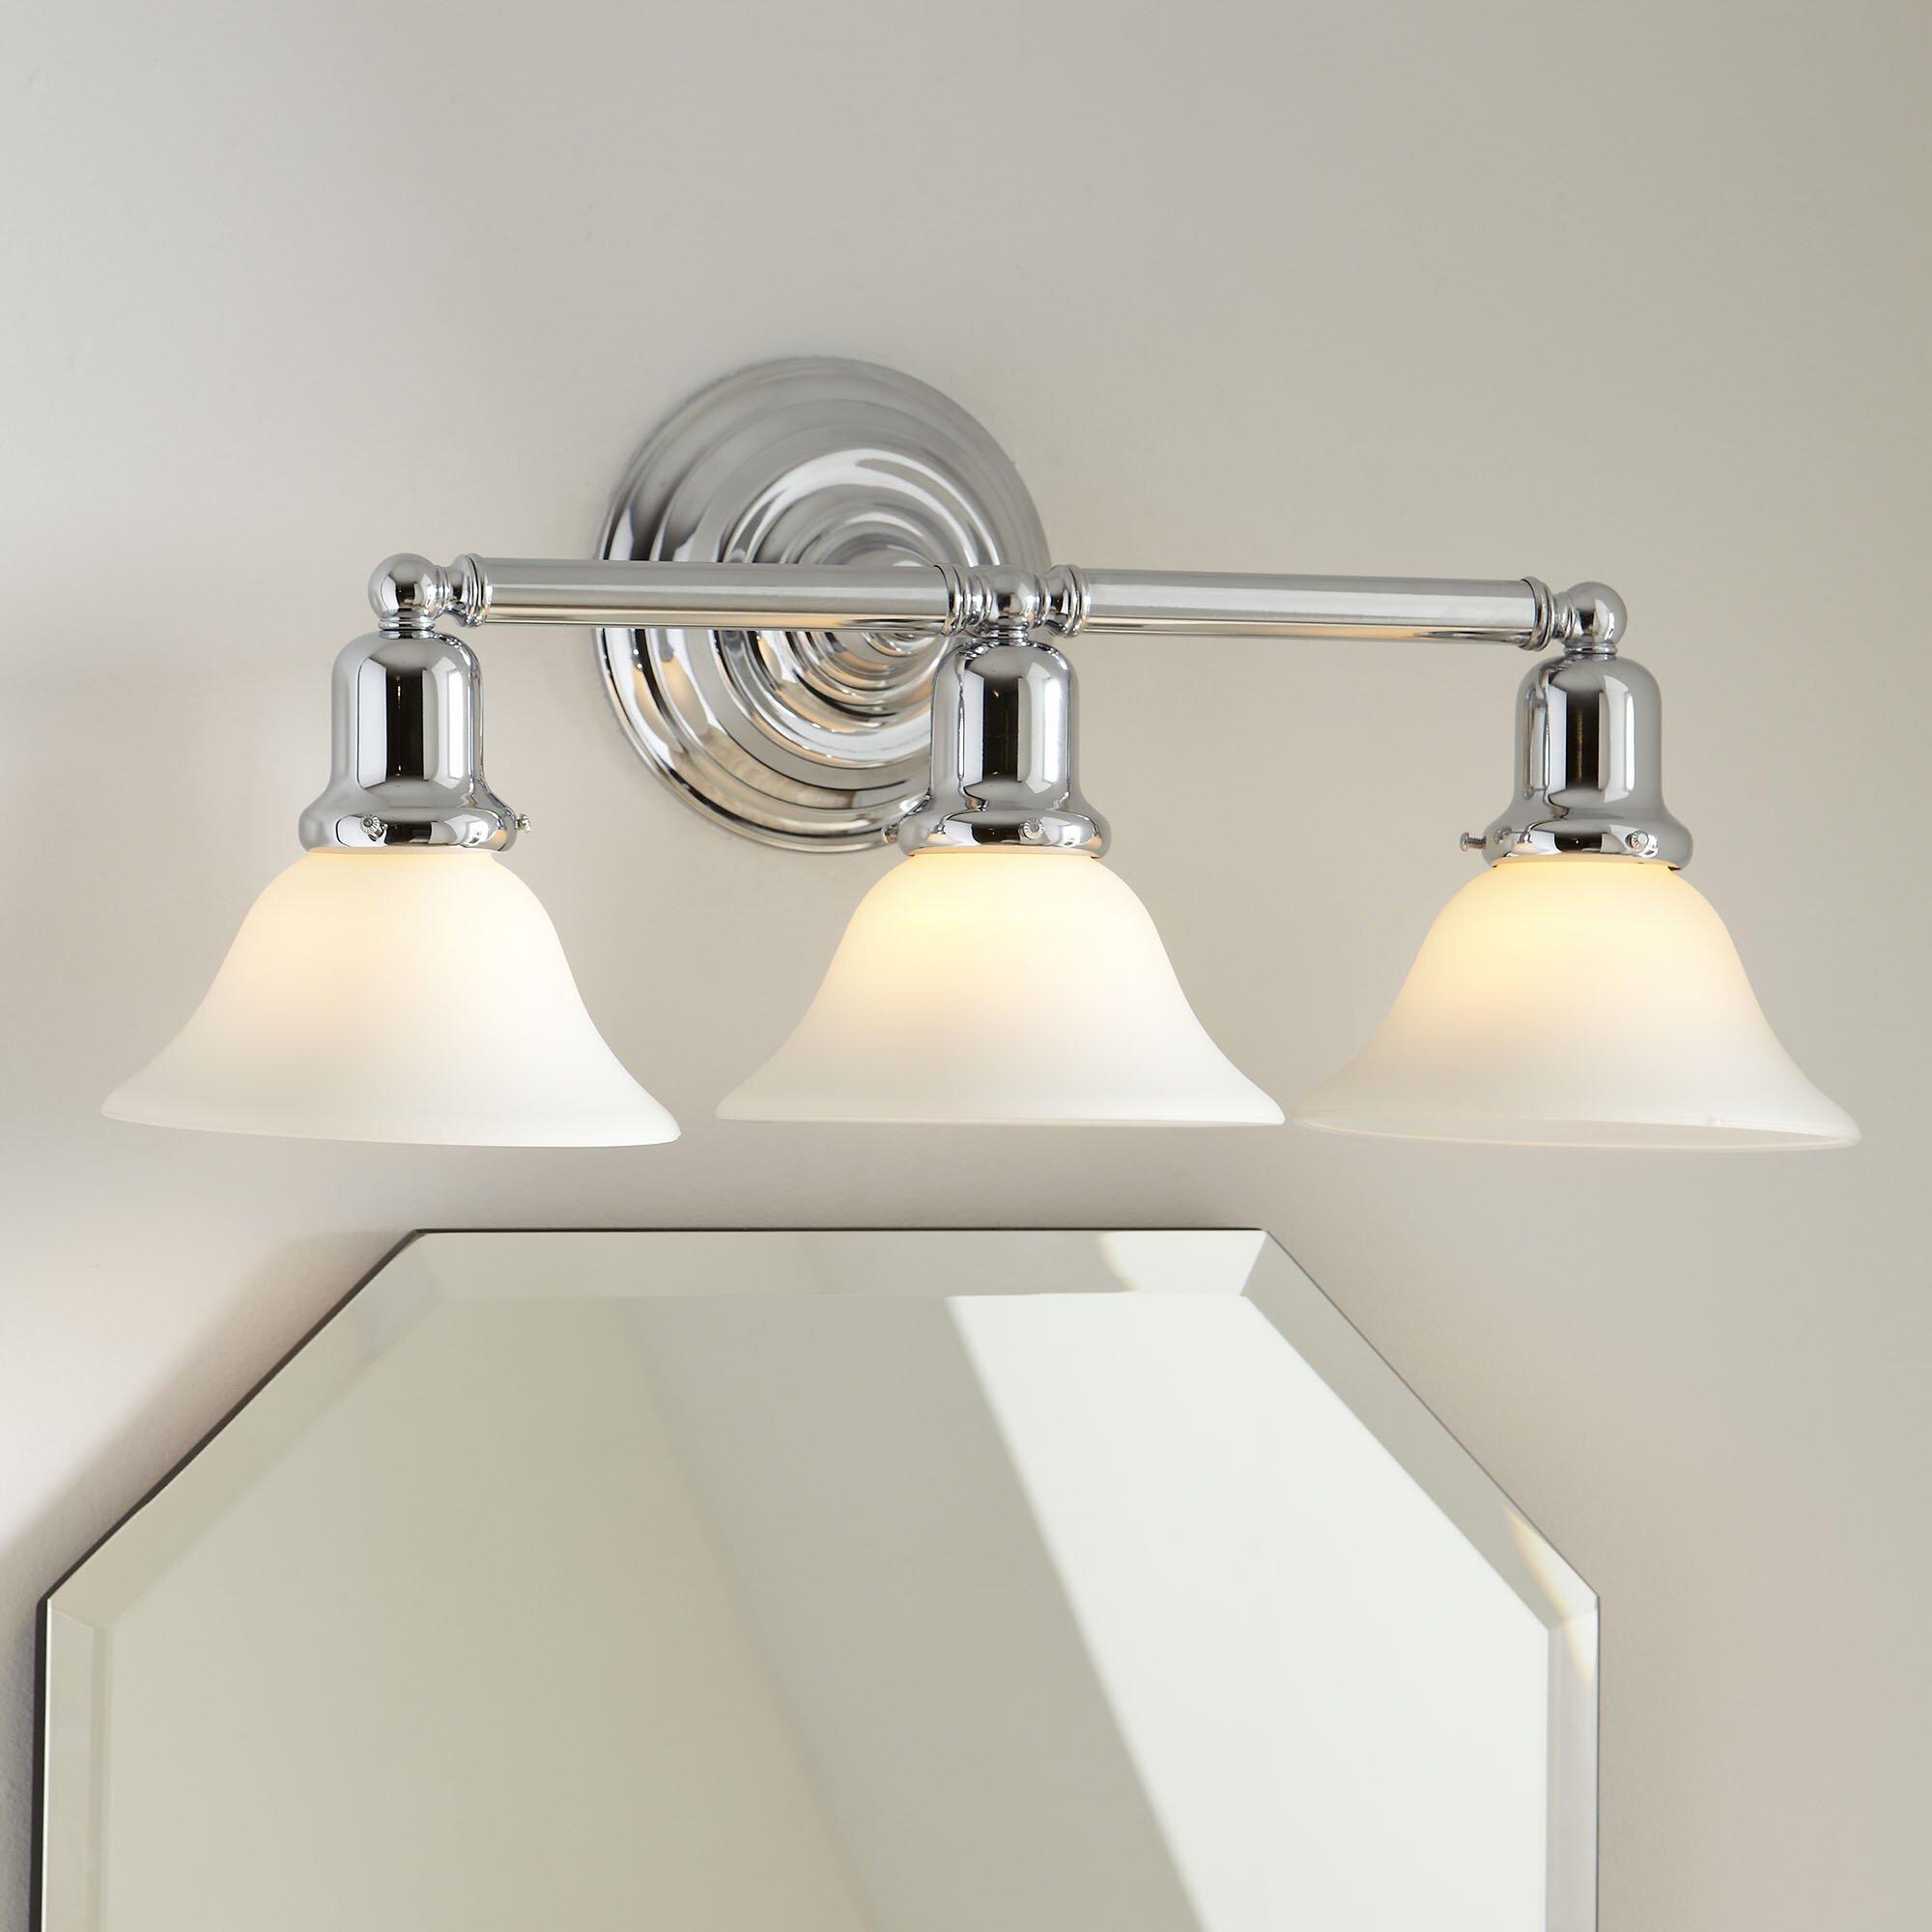 Vanity Light Bulb Covers : Birch Lane Arlington 3-Bulb Vanity Light & Reviews Wayfair